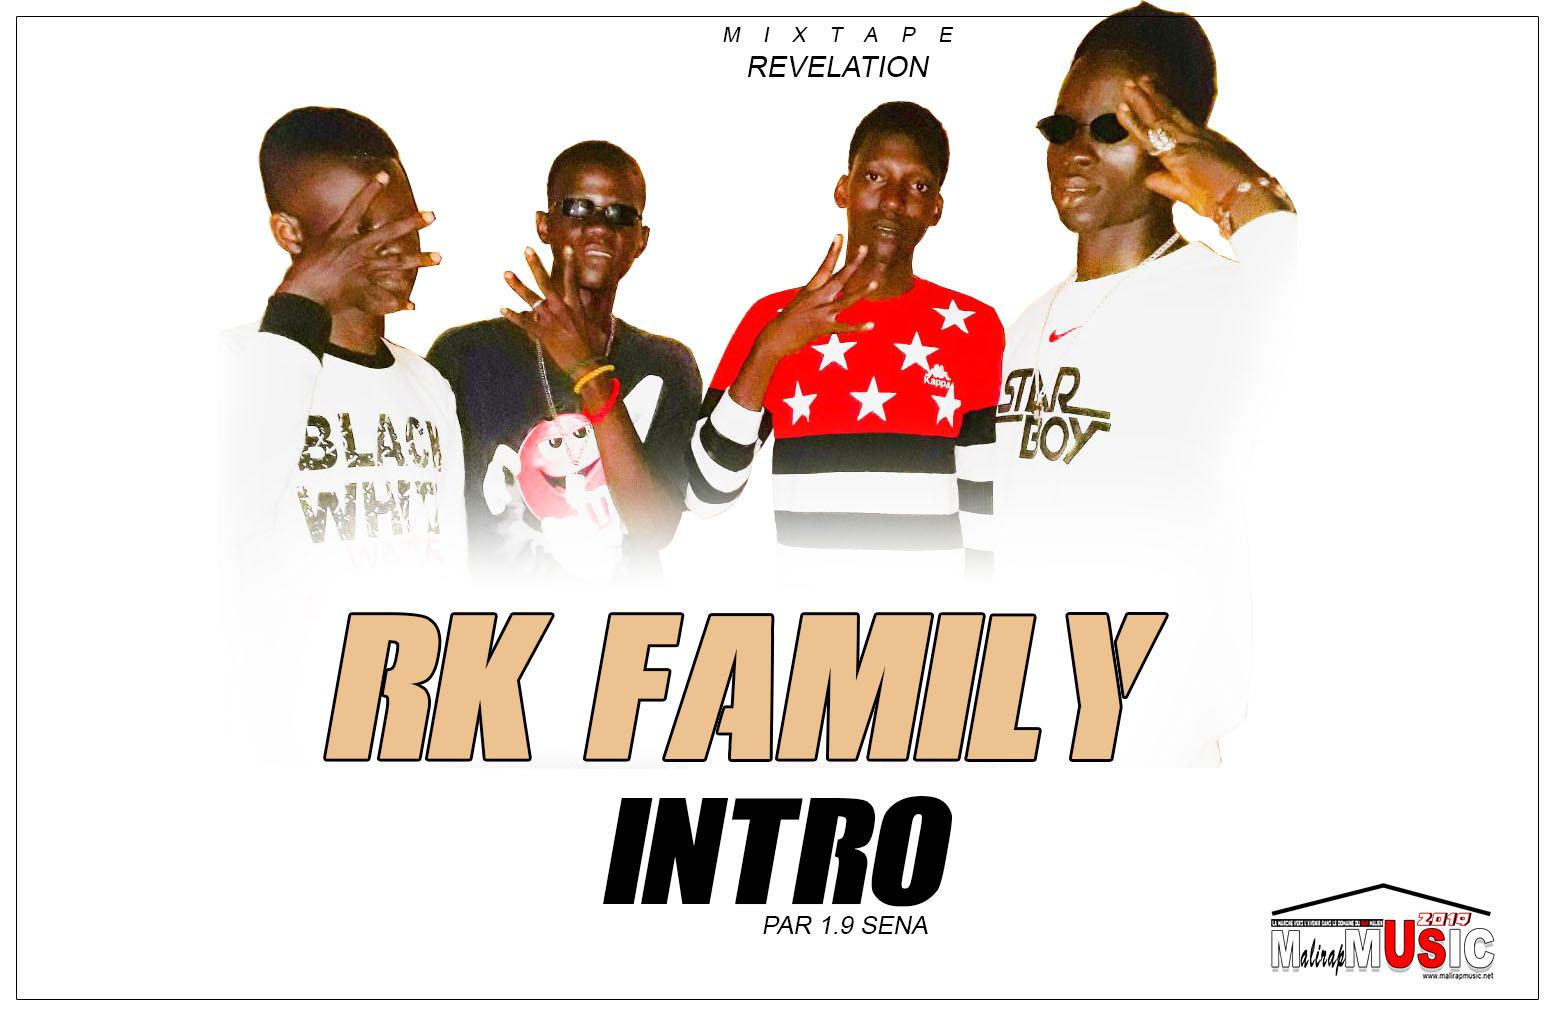 RK FAMILY – INTRO (Mixtape REVELATION 2019)